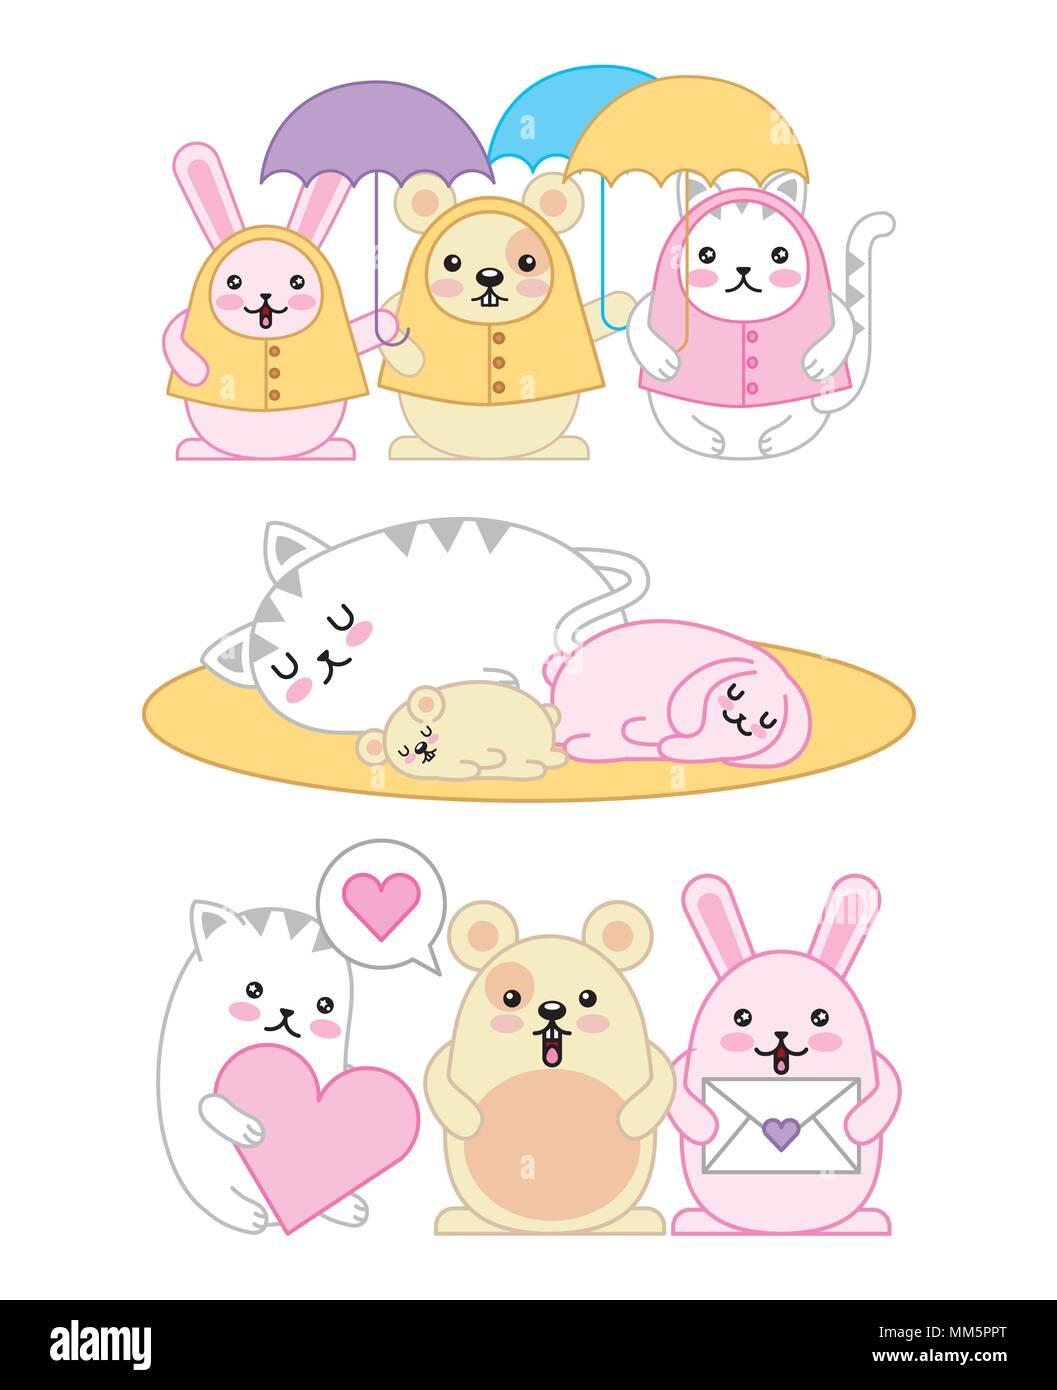 Image of: Kawaii Drawings Kawaii Animals Mouse Kitty Cat And Rabbit Cartoon Vector Illustration Alamy Kawaii Animals Mouse Kitty Cat And Rabbit Cartoon Vector